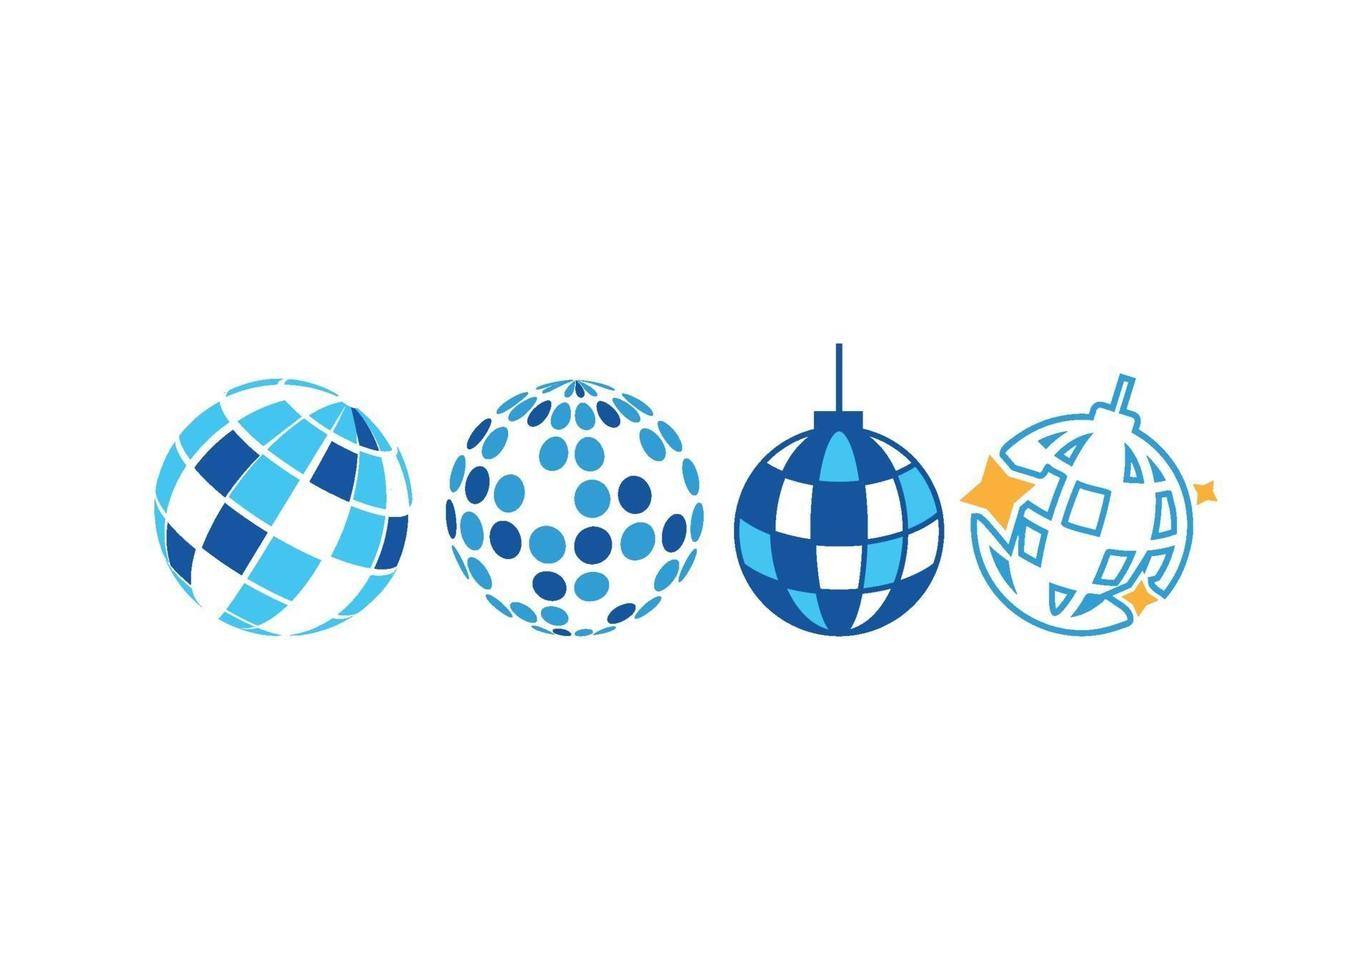 disco ball icon illustration vector set